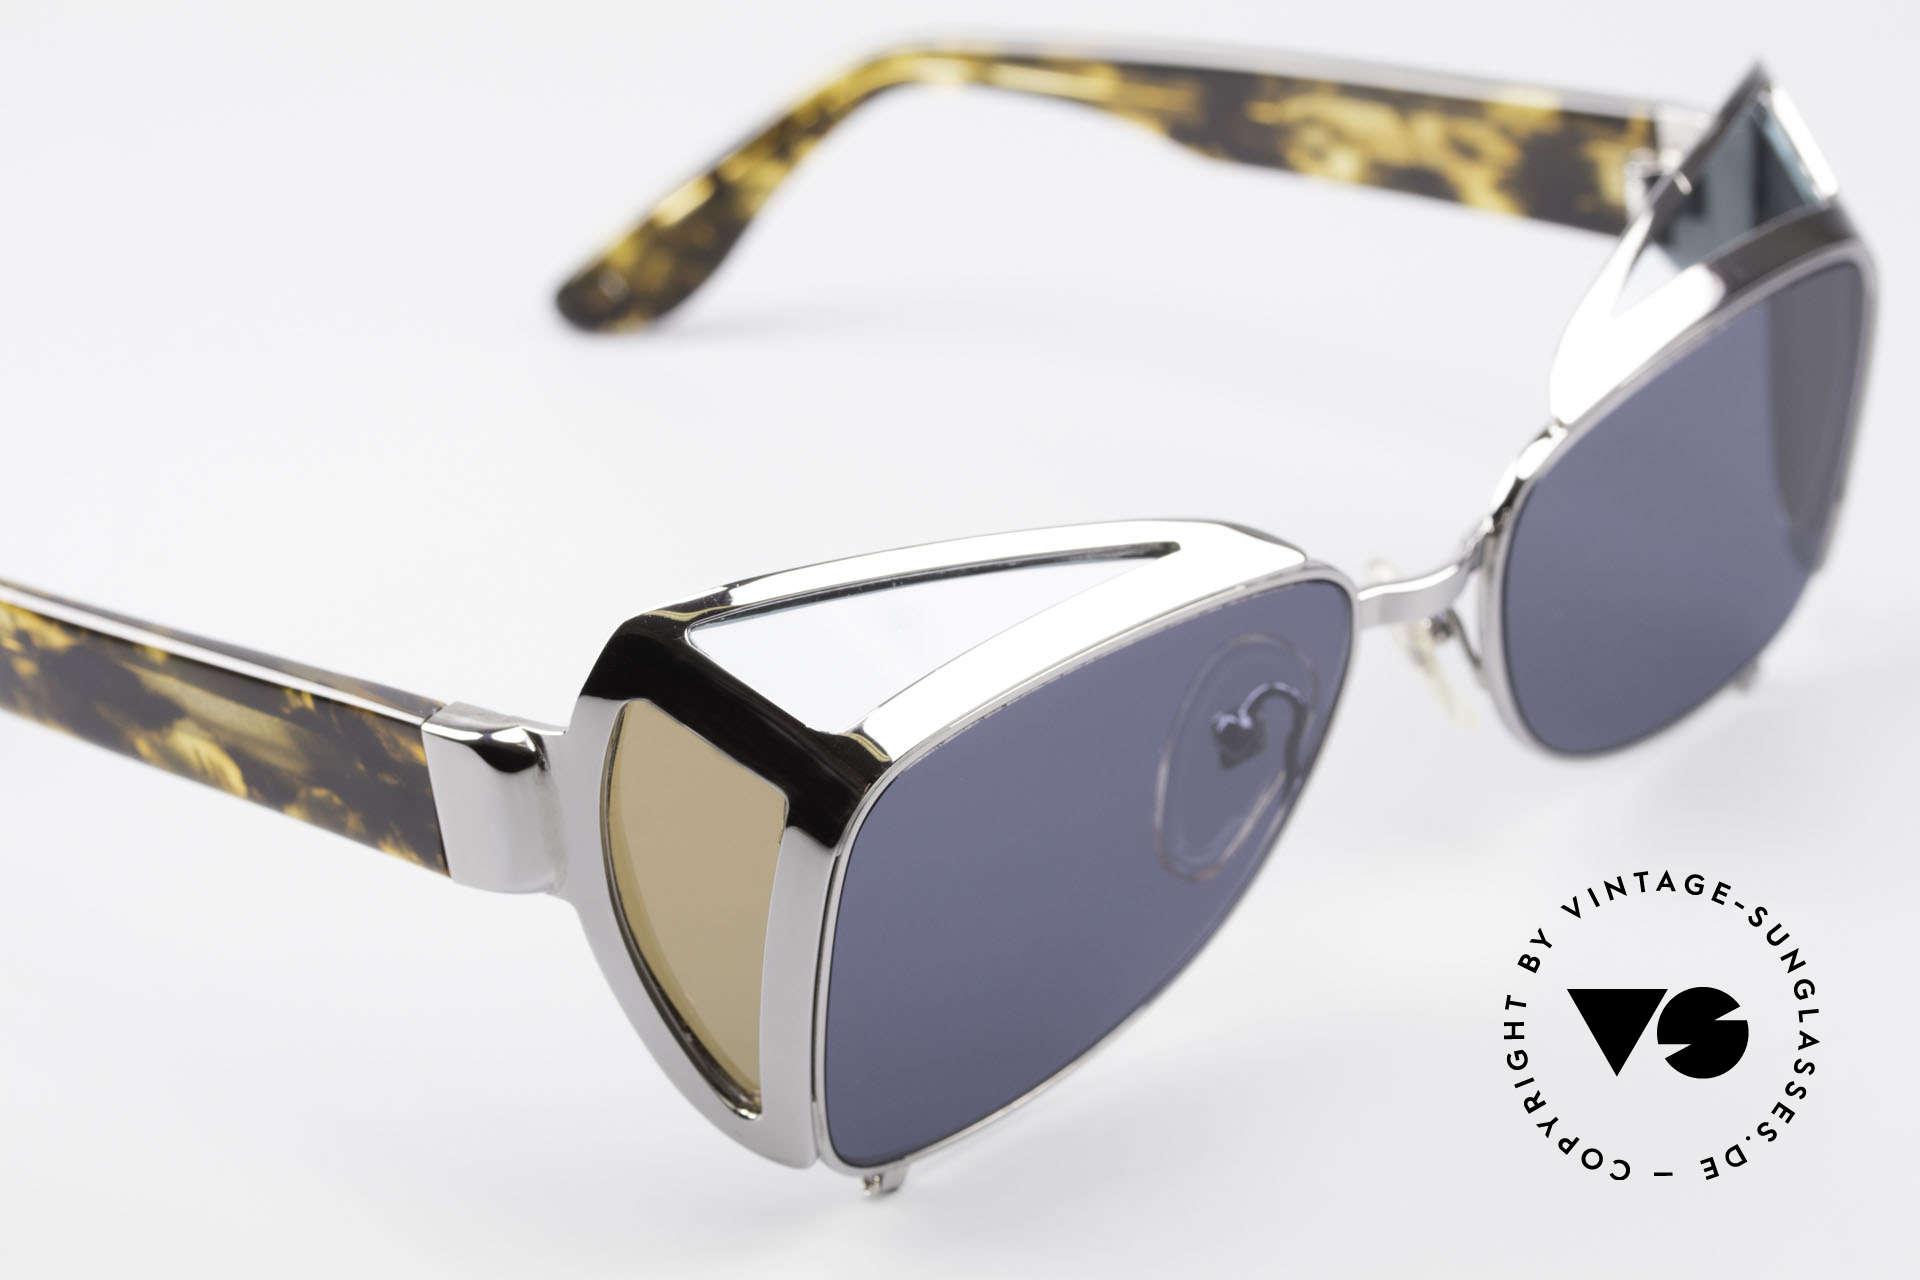 Jean Paul Gaultier 56-9272 Rare Steampunk Sunglasses, NO RETRO sunglasses but an old 90's original!, Made for Men